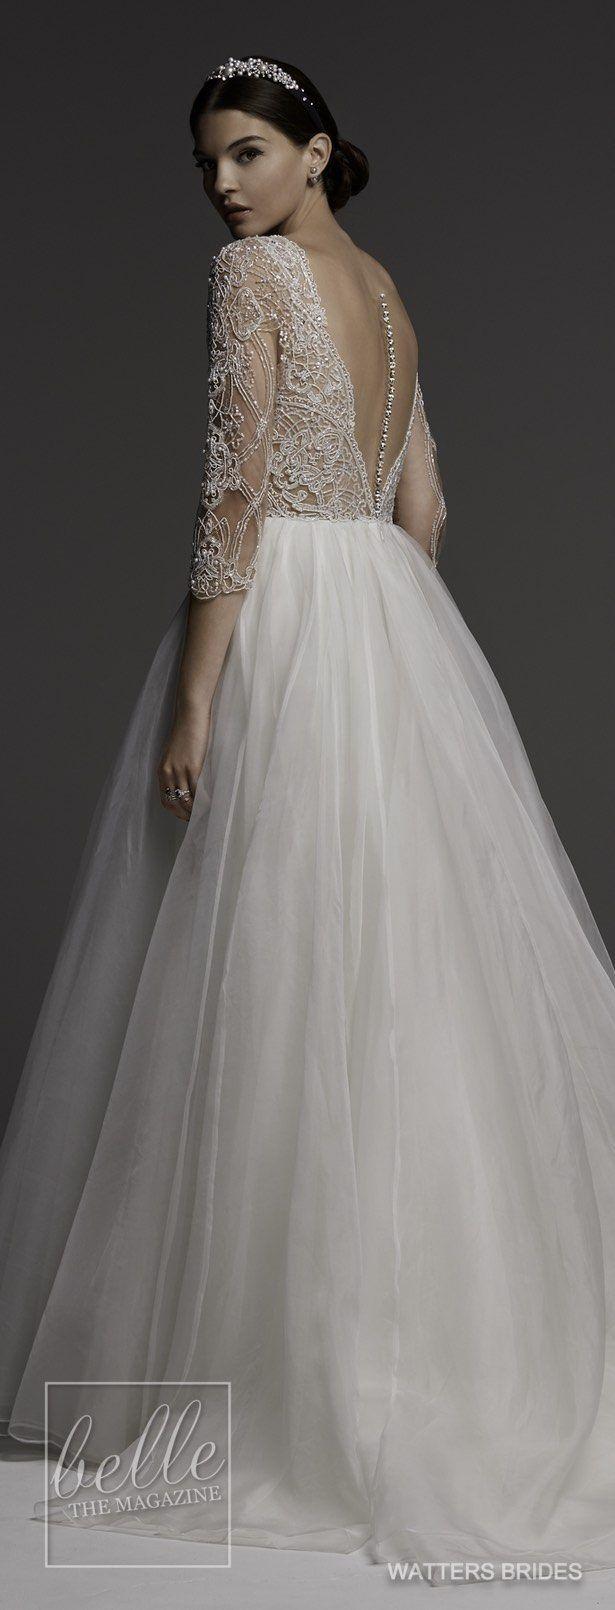 Wedding dresses by watters brides spring bridal dresses